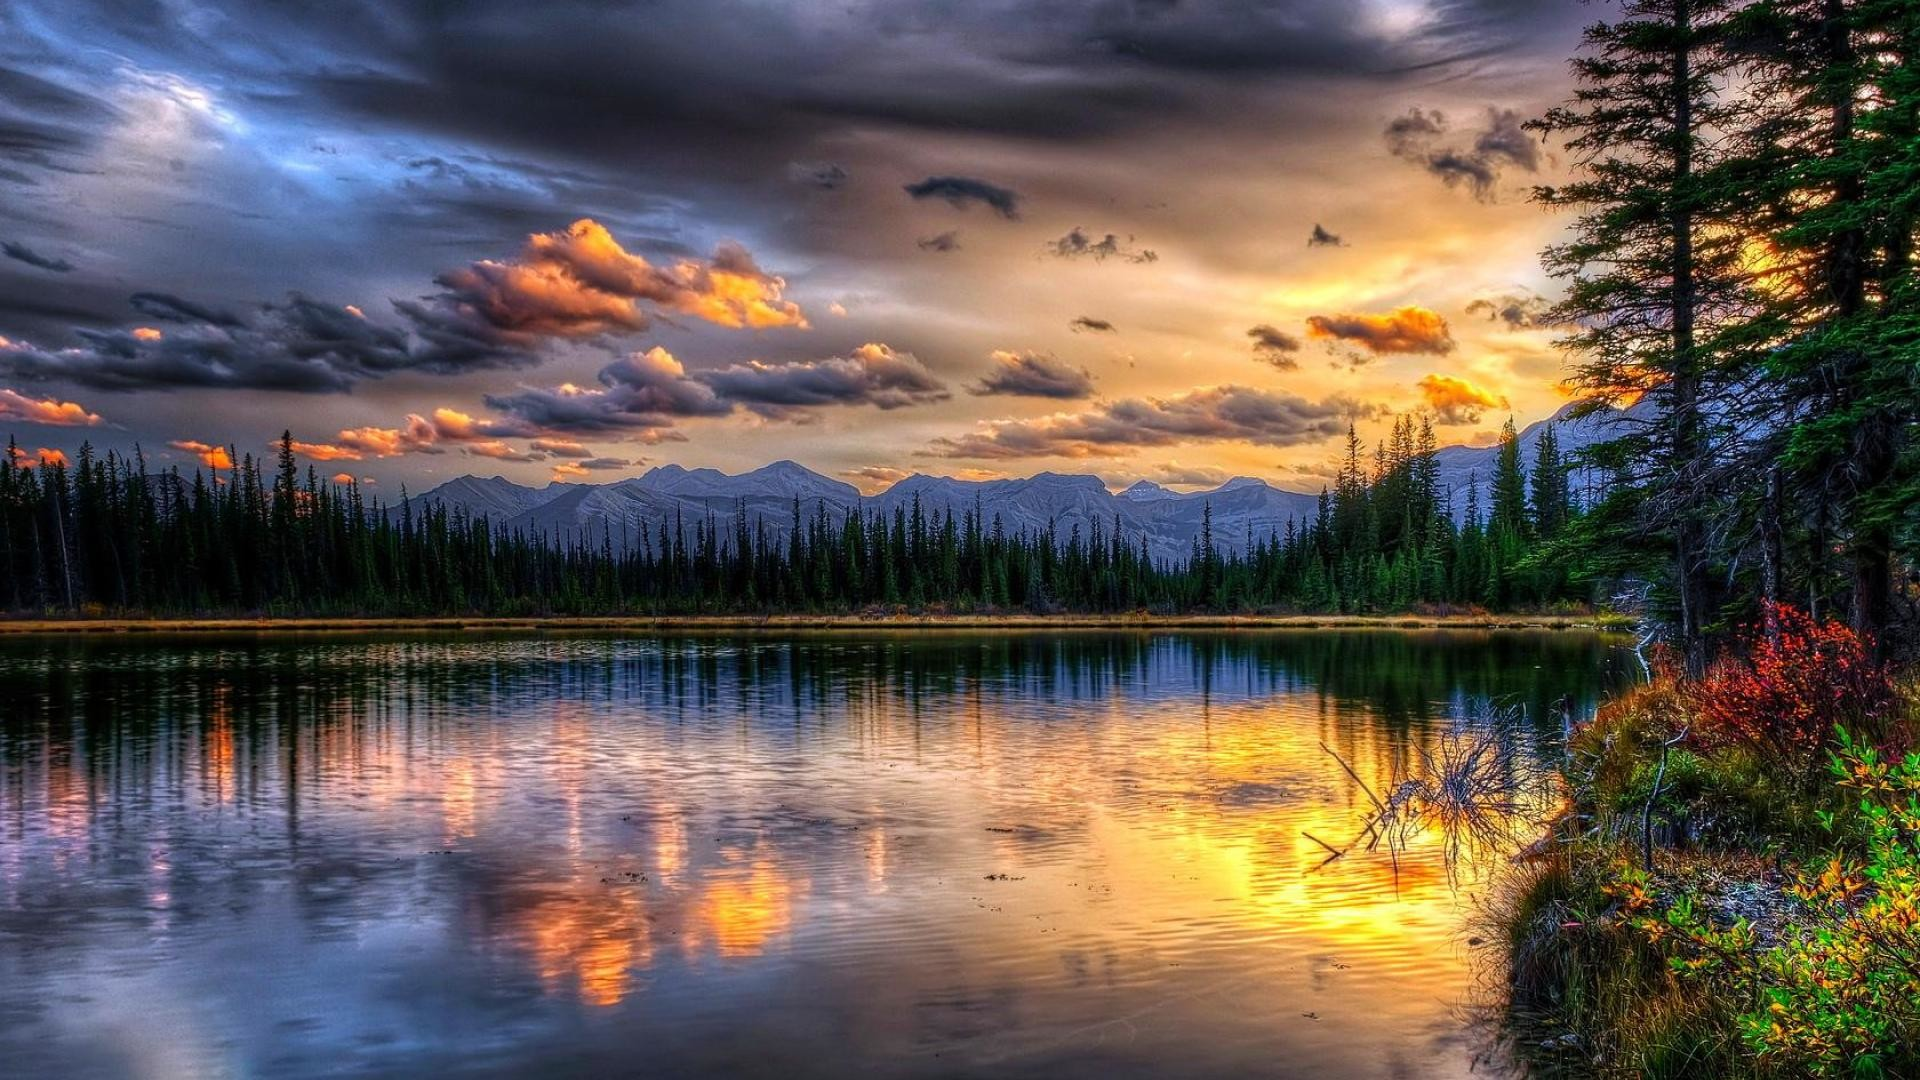 1920x1080 Most Beautiful Mountain View Landscape Desktop Wallpaper